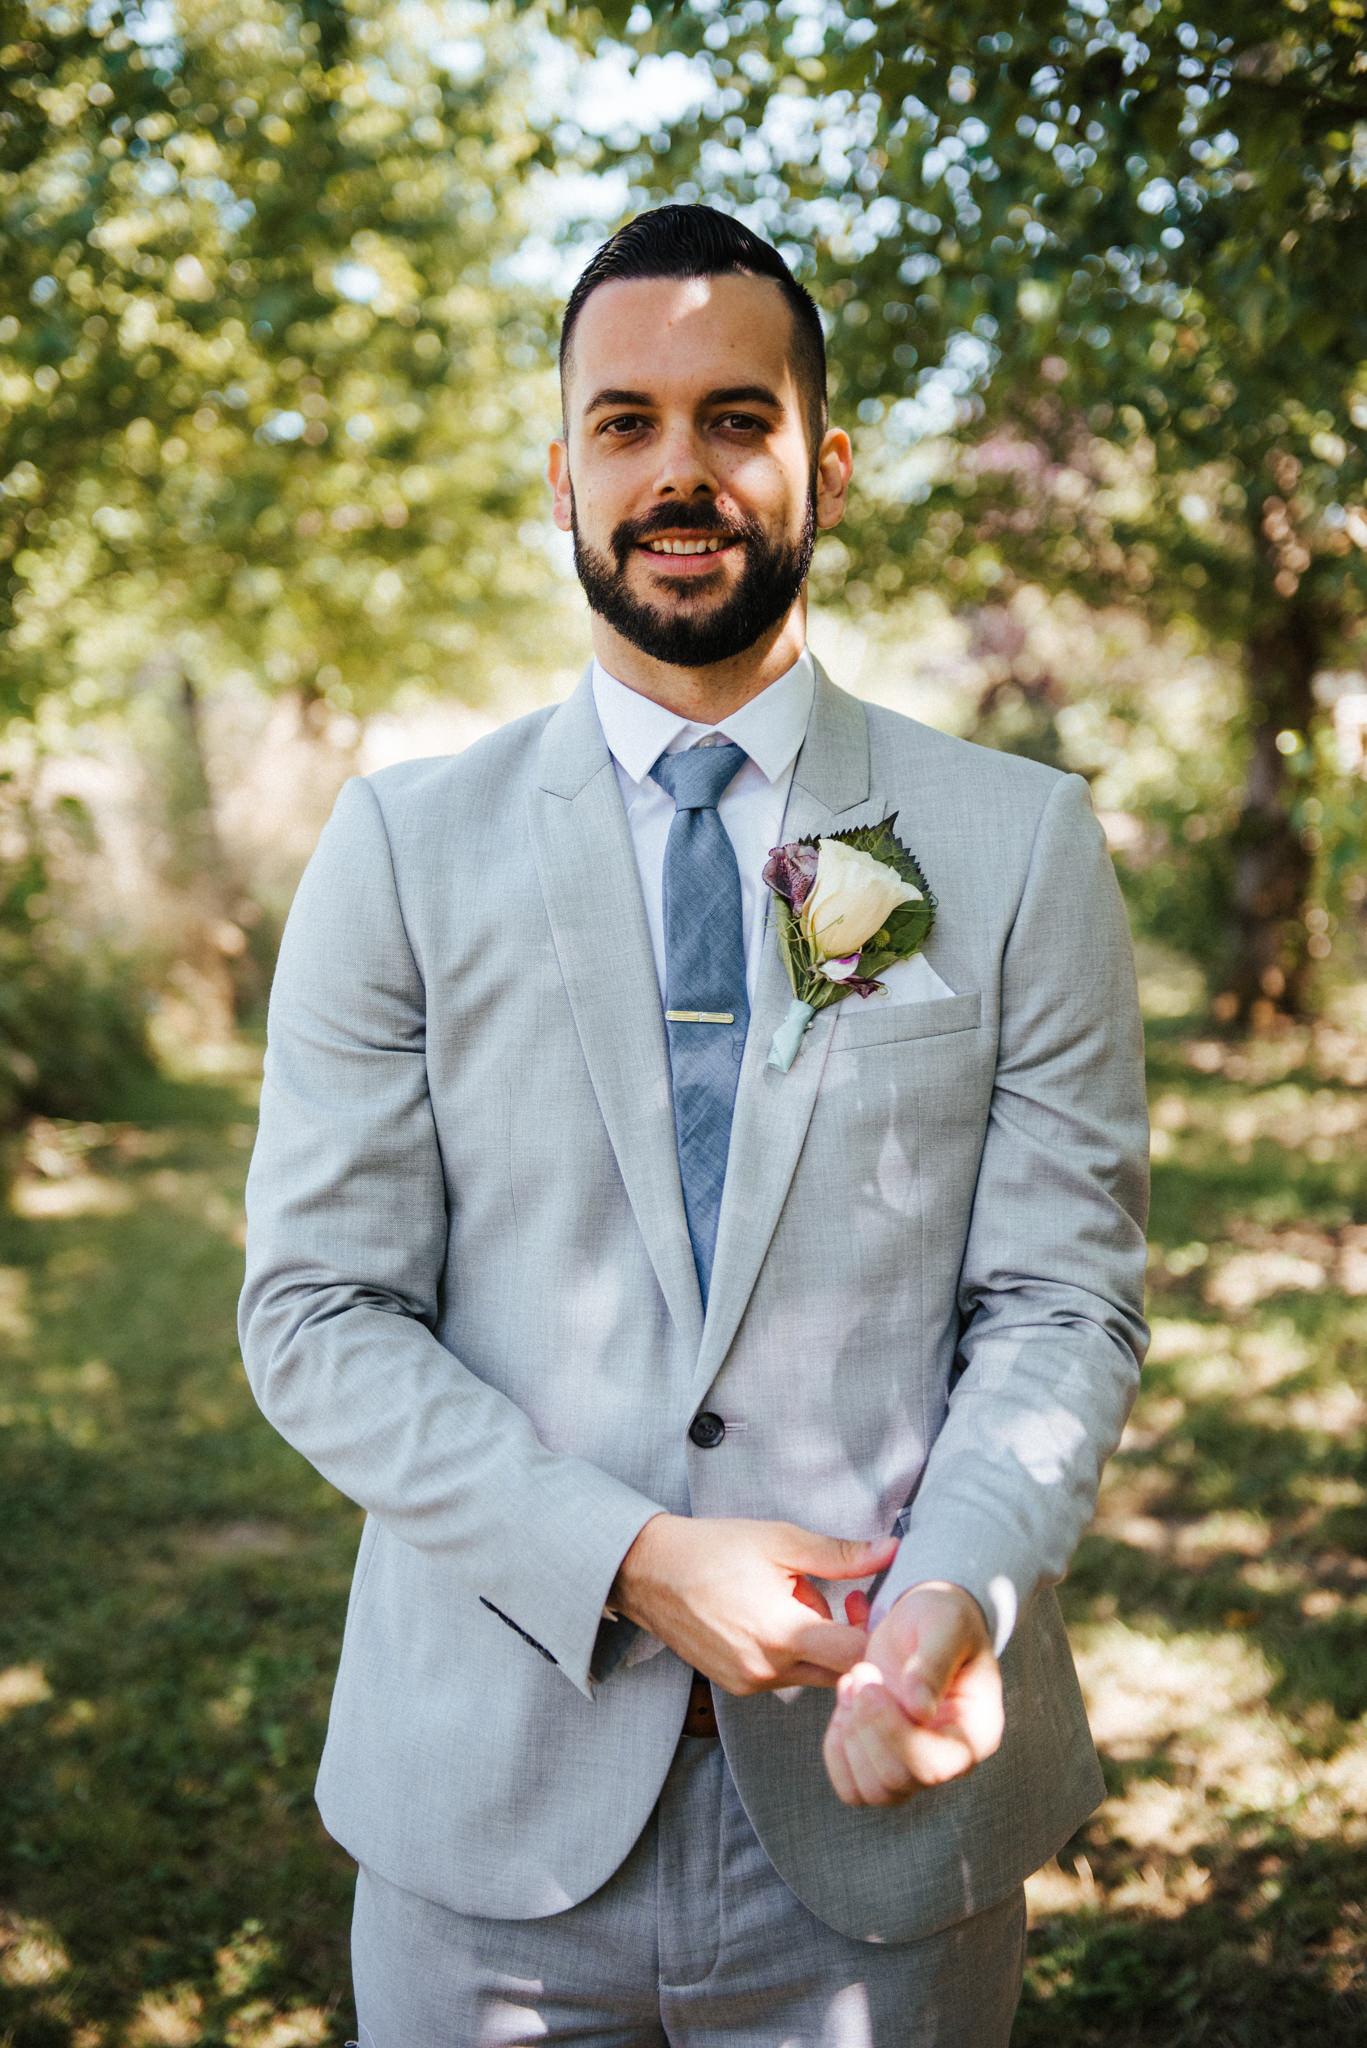 Amy Steven Seattle Wedding Photographer Vishal Goklani_015.jpg